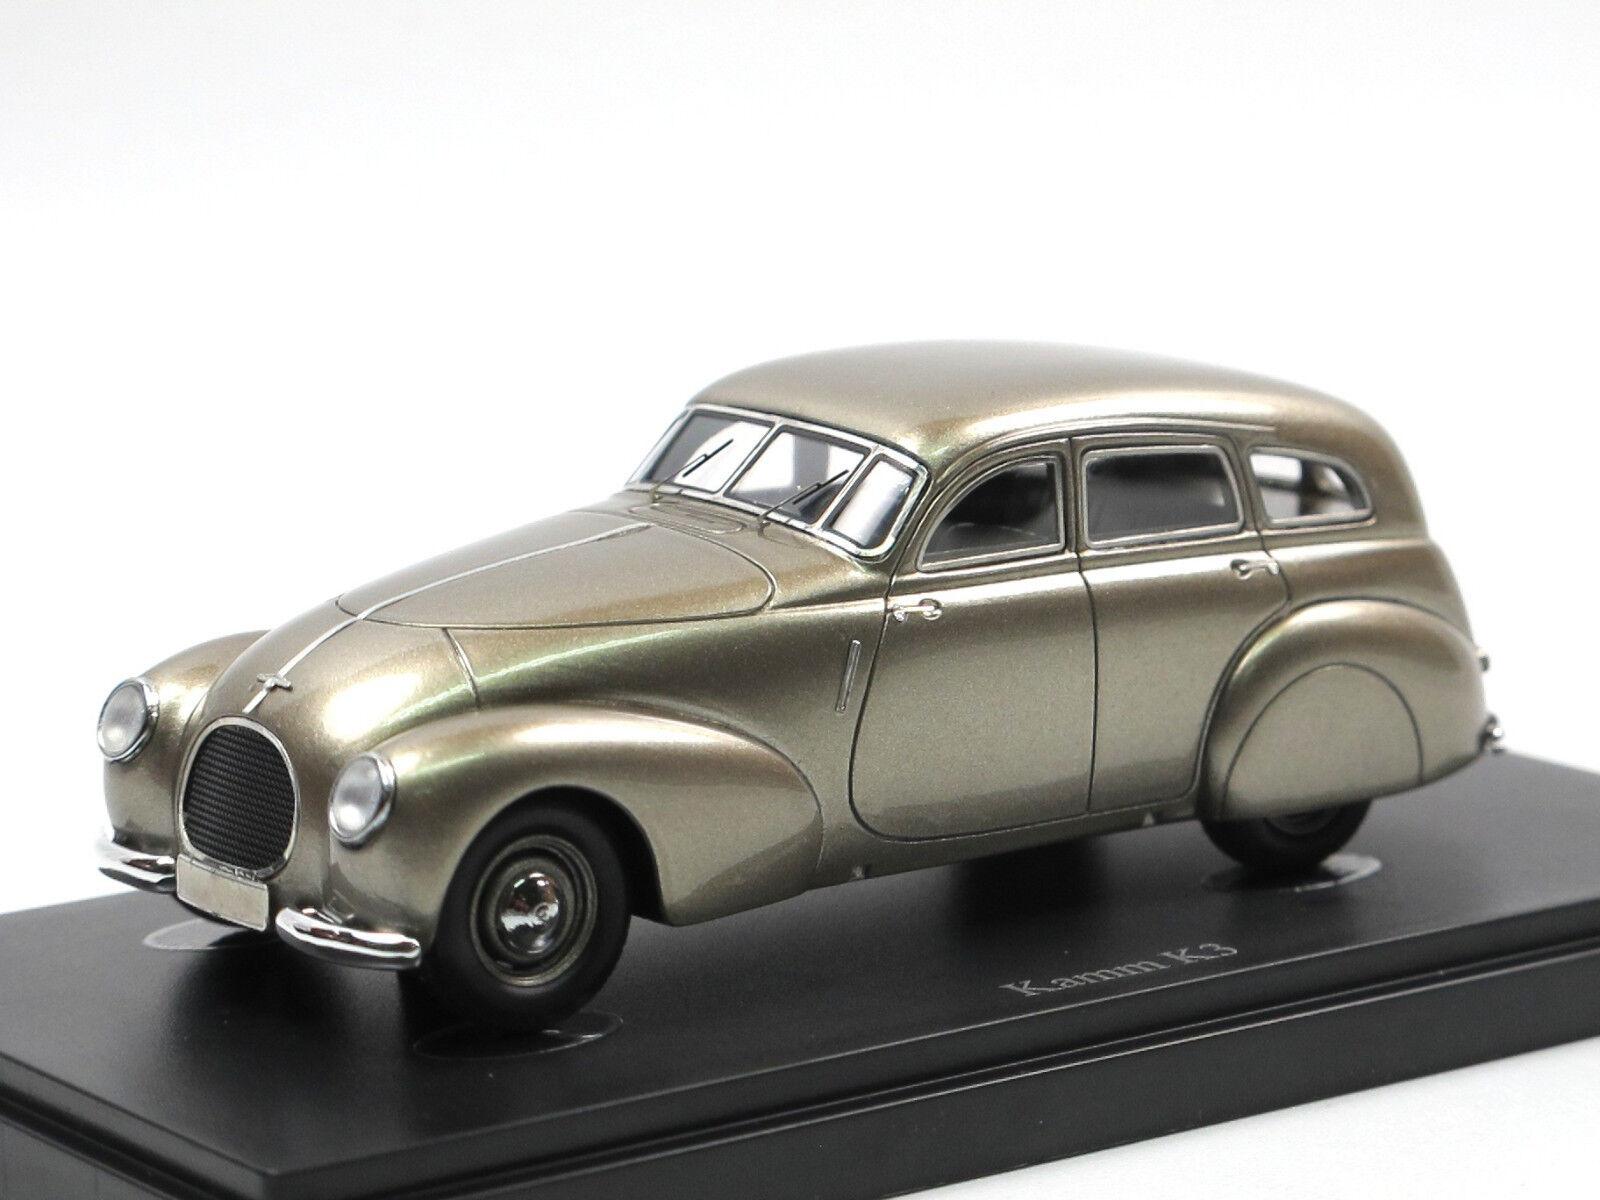 Autocult 04012 1939 Peigne k3 peigne-Voiture Chassis MERCEDES 170 V 1 43